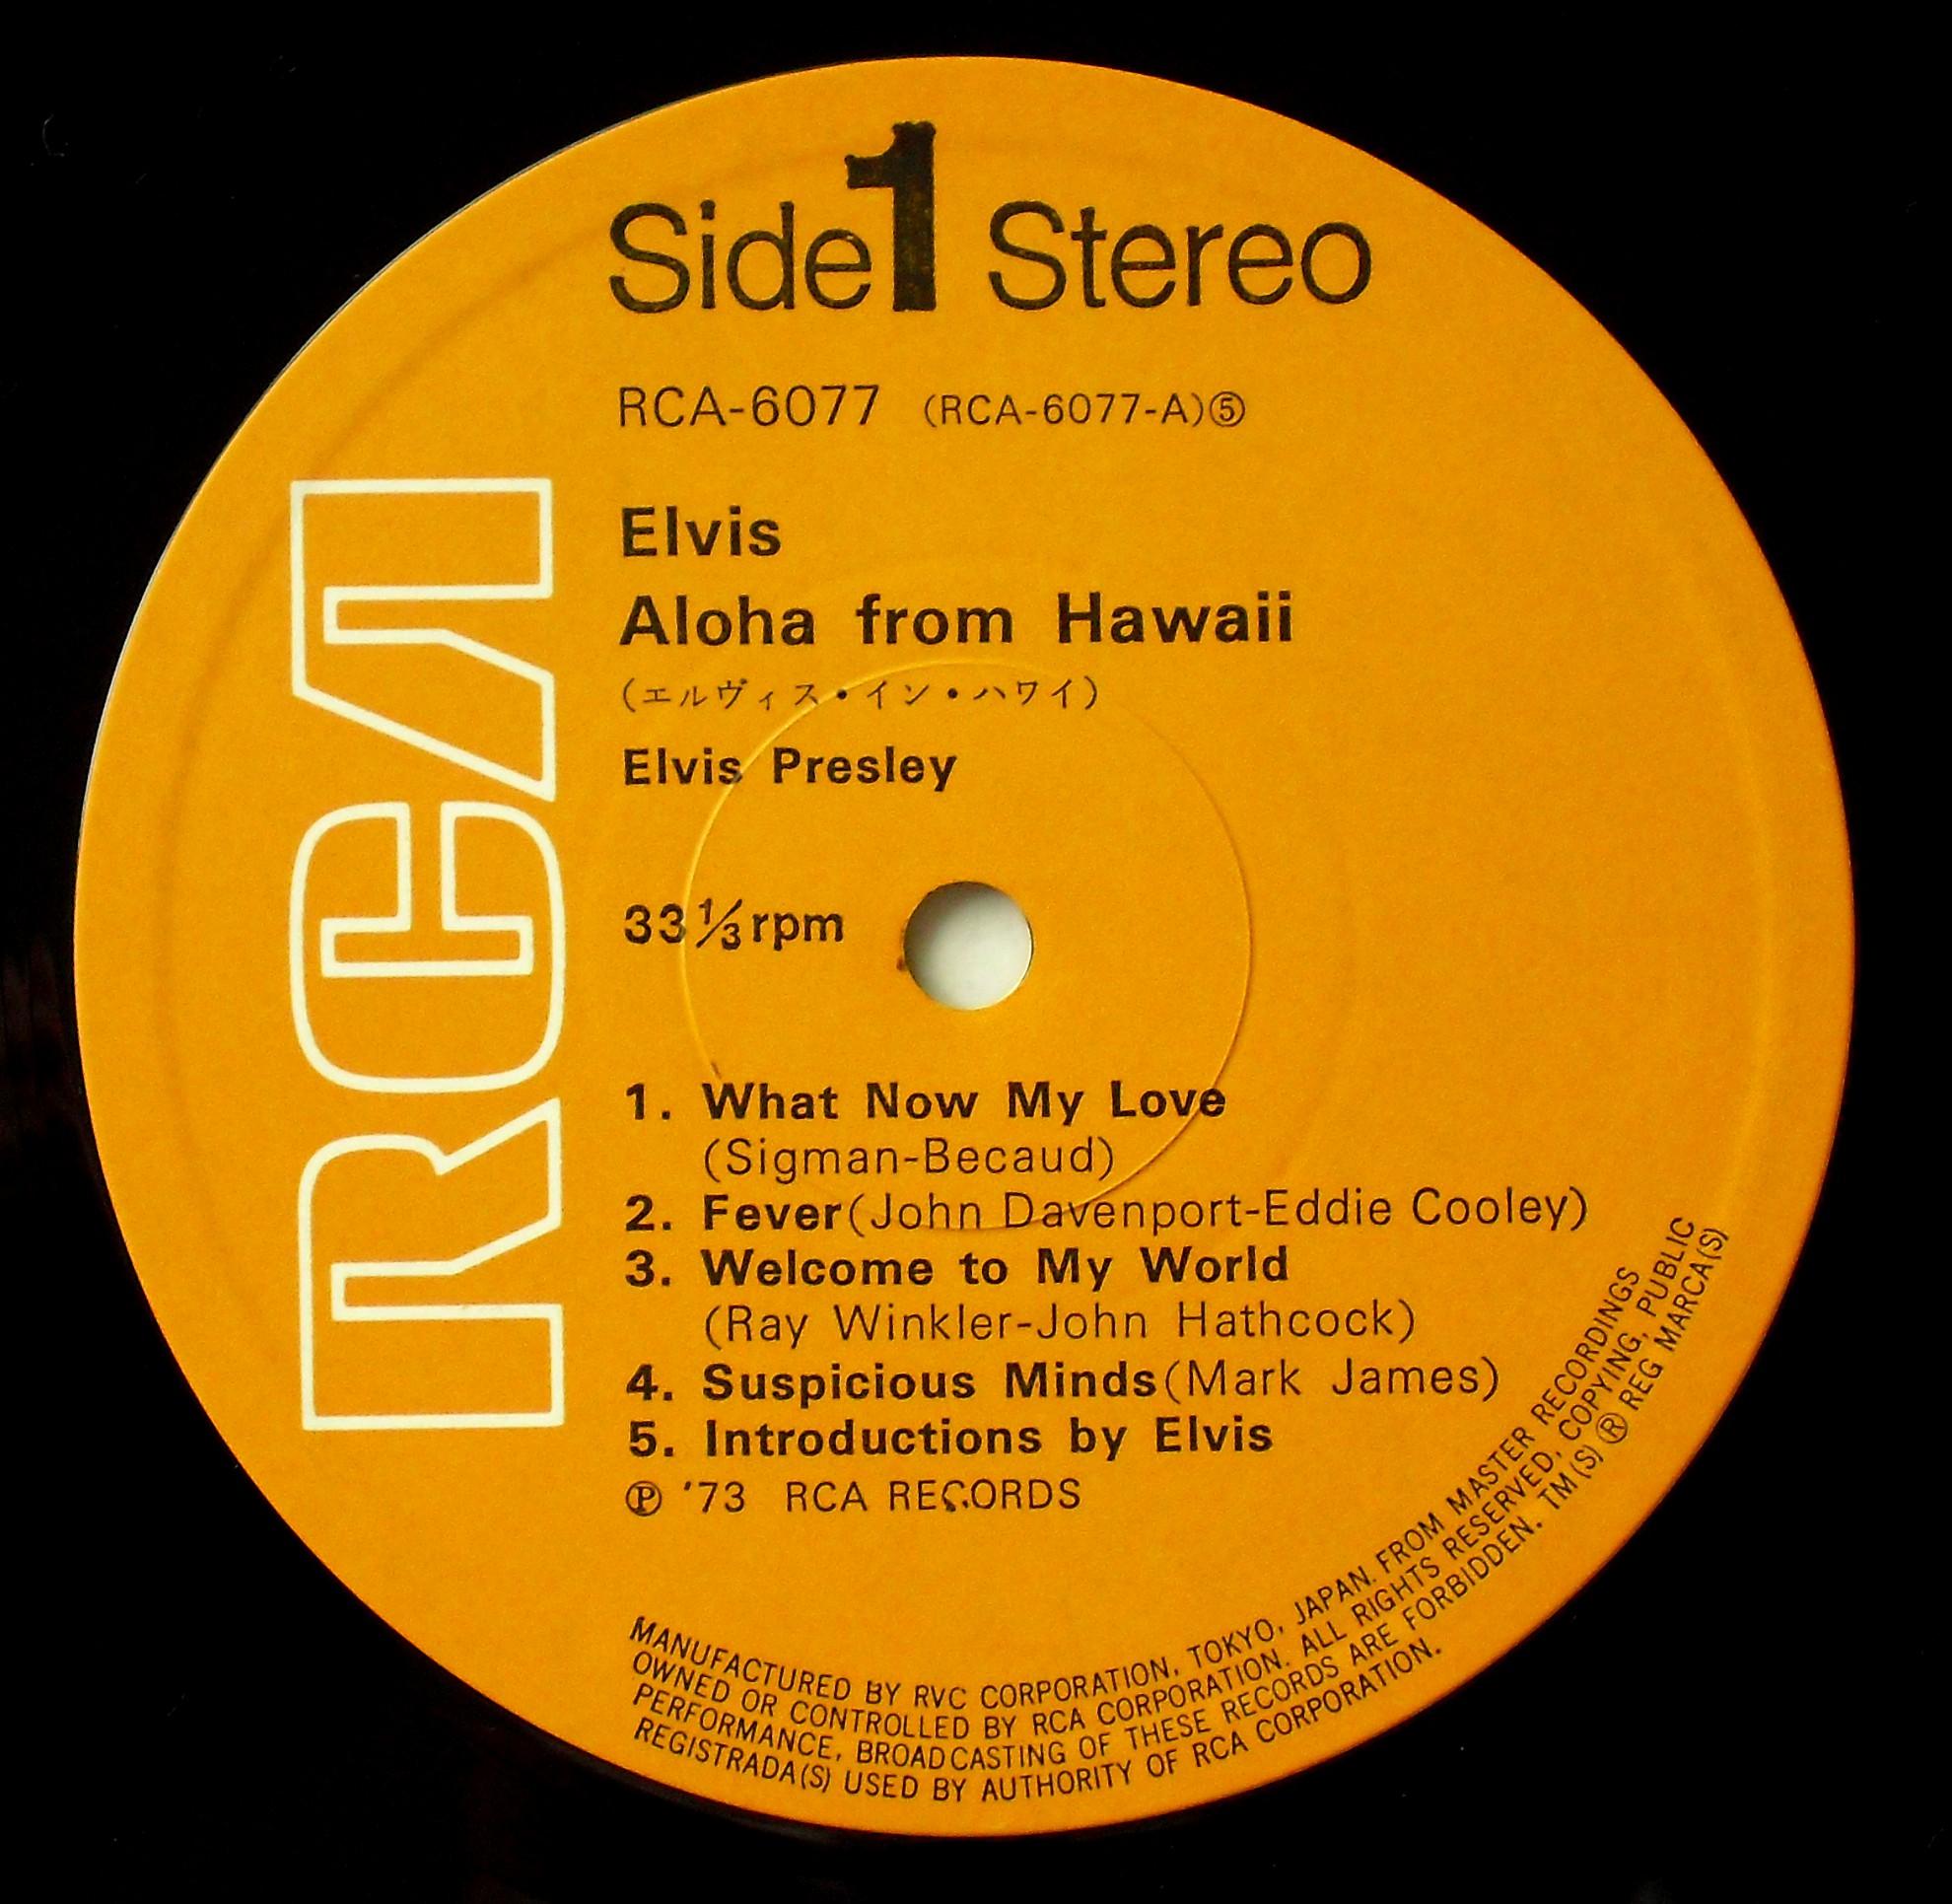 ALOHA FROM HAWAII VIA SATELLITE 11s3xfypj